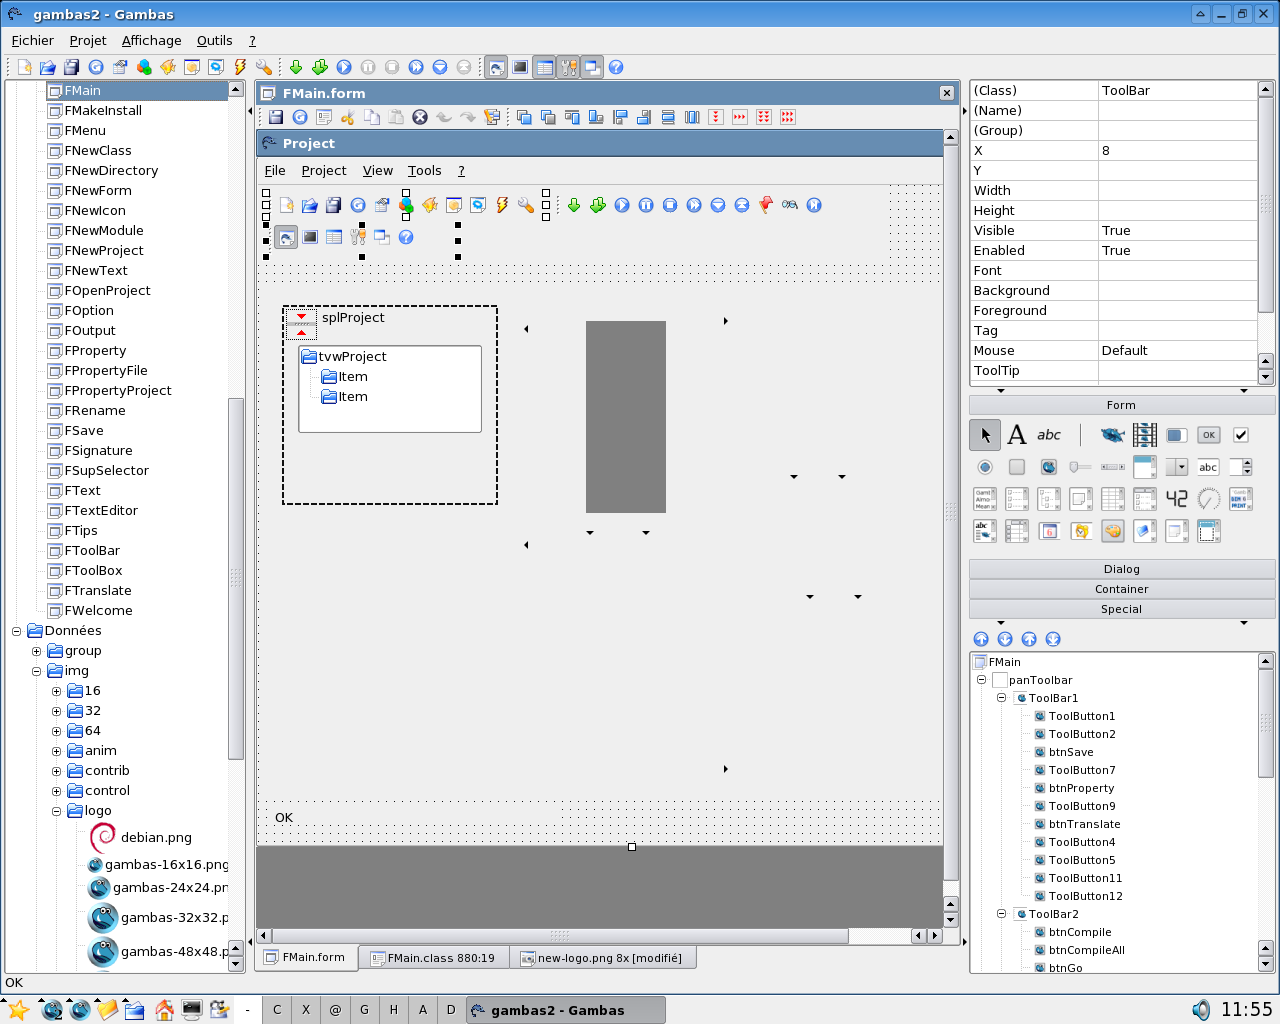 Freie Basic-Entwicklungsumgebung Gambas 2.0 erschienen - Gambas 2.0